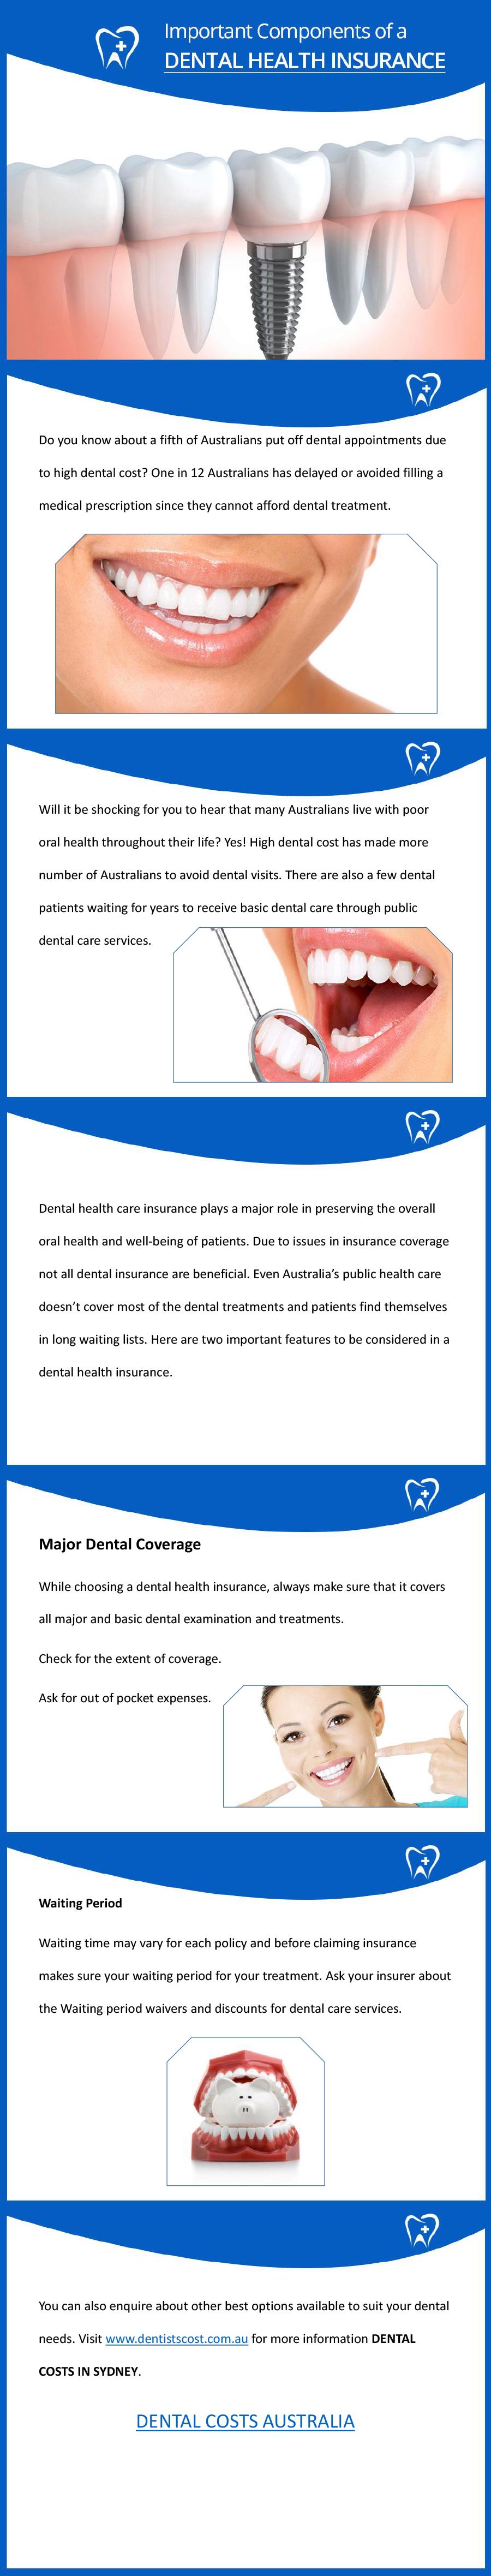 Pin by dental costs australia on dental costs australia